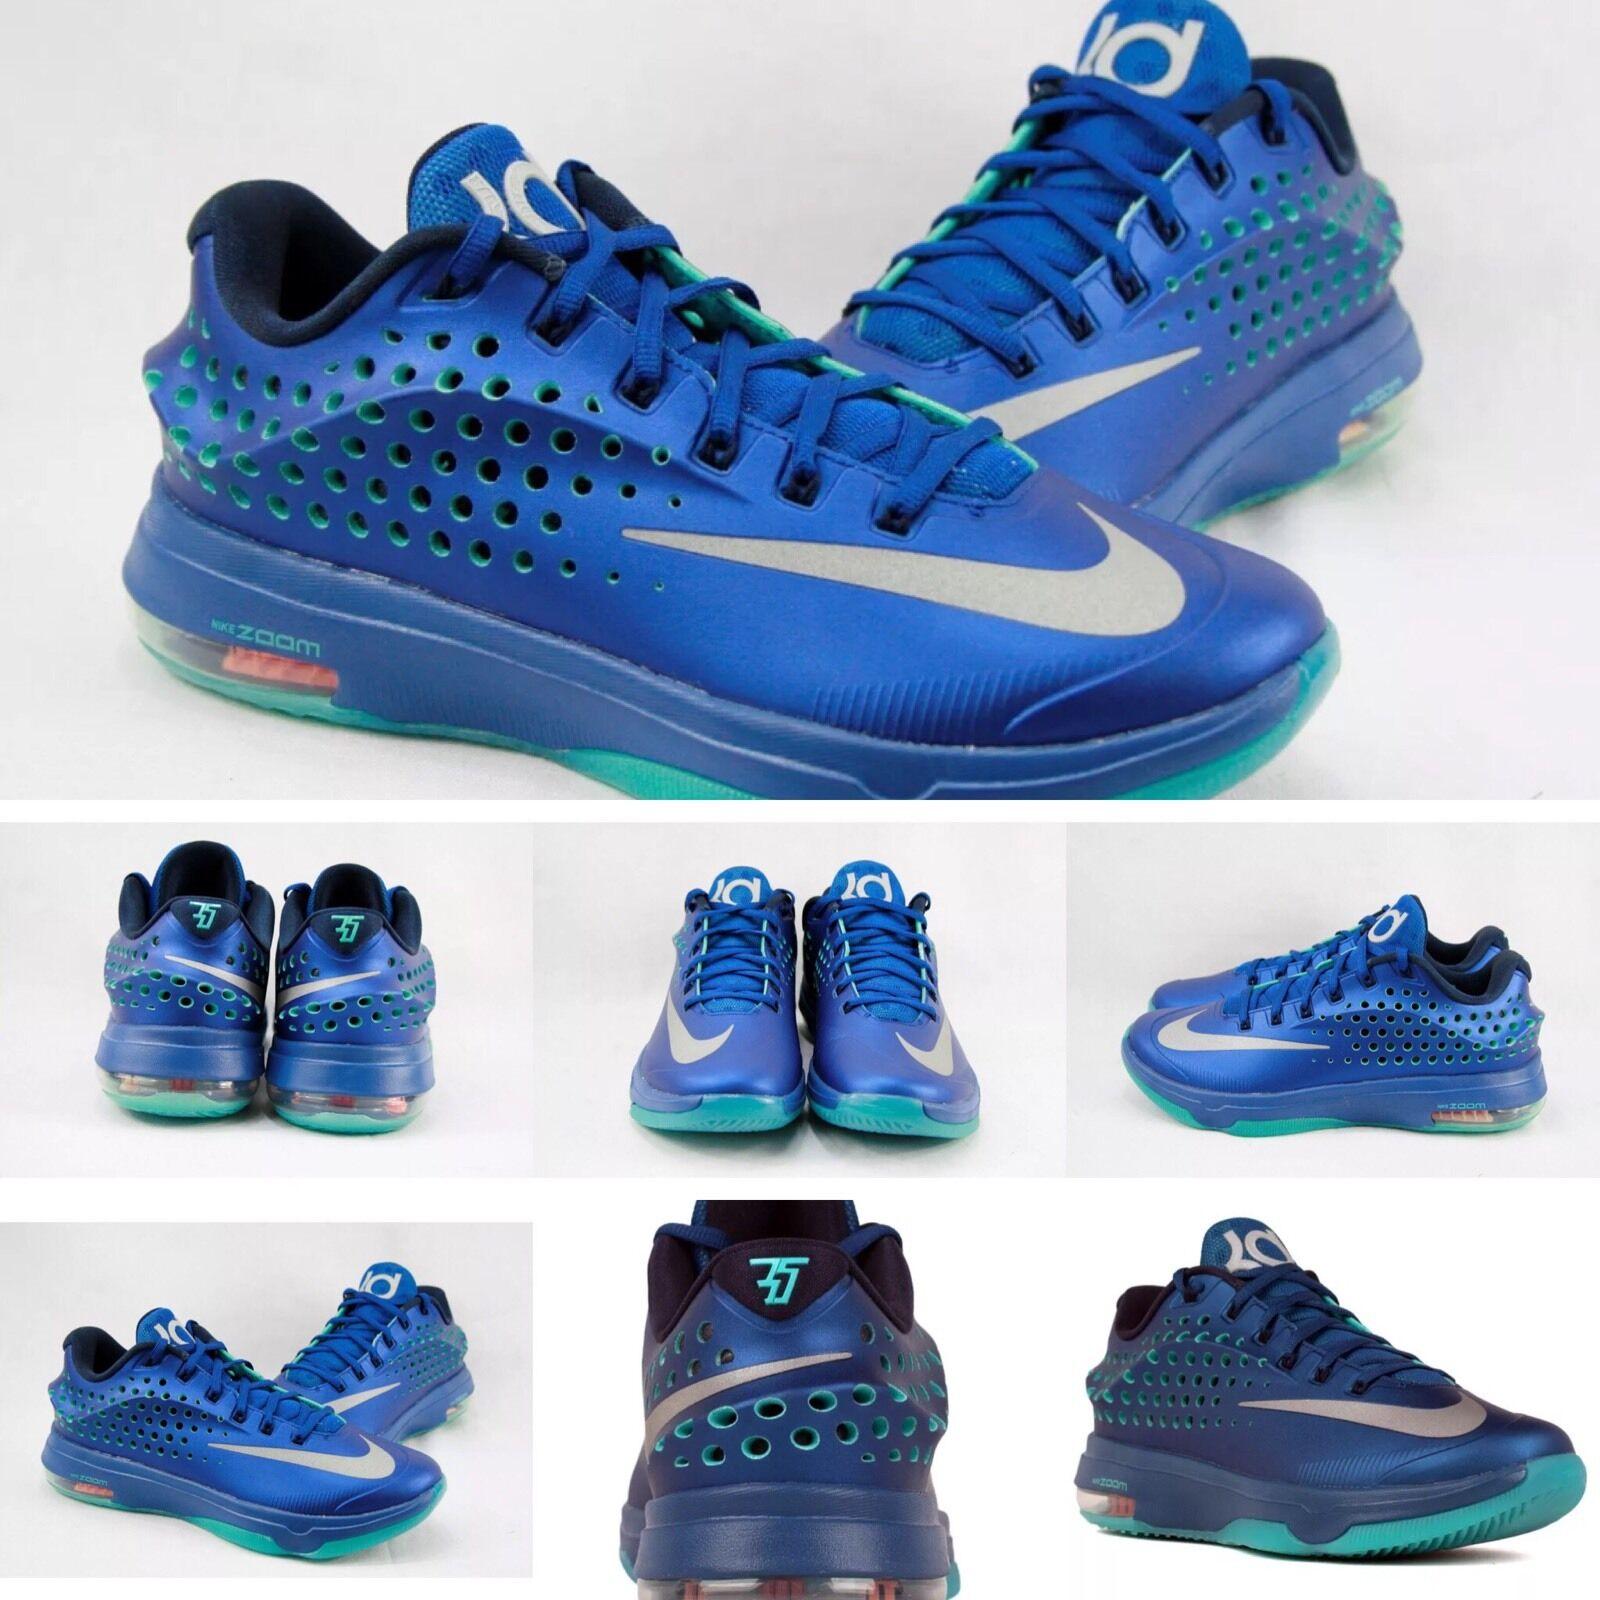 Nike KD VII 7 Elite Gym Blue/Metallic Silver 724349-404 size 10 Kevin DURANT